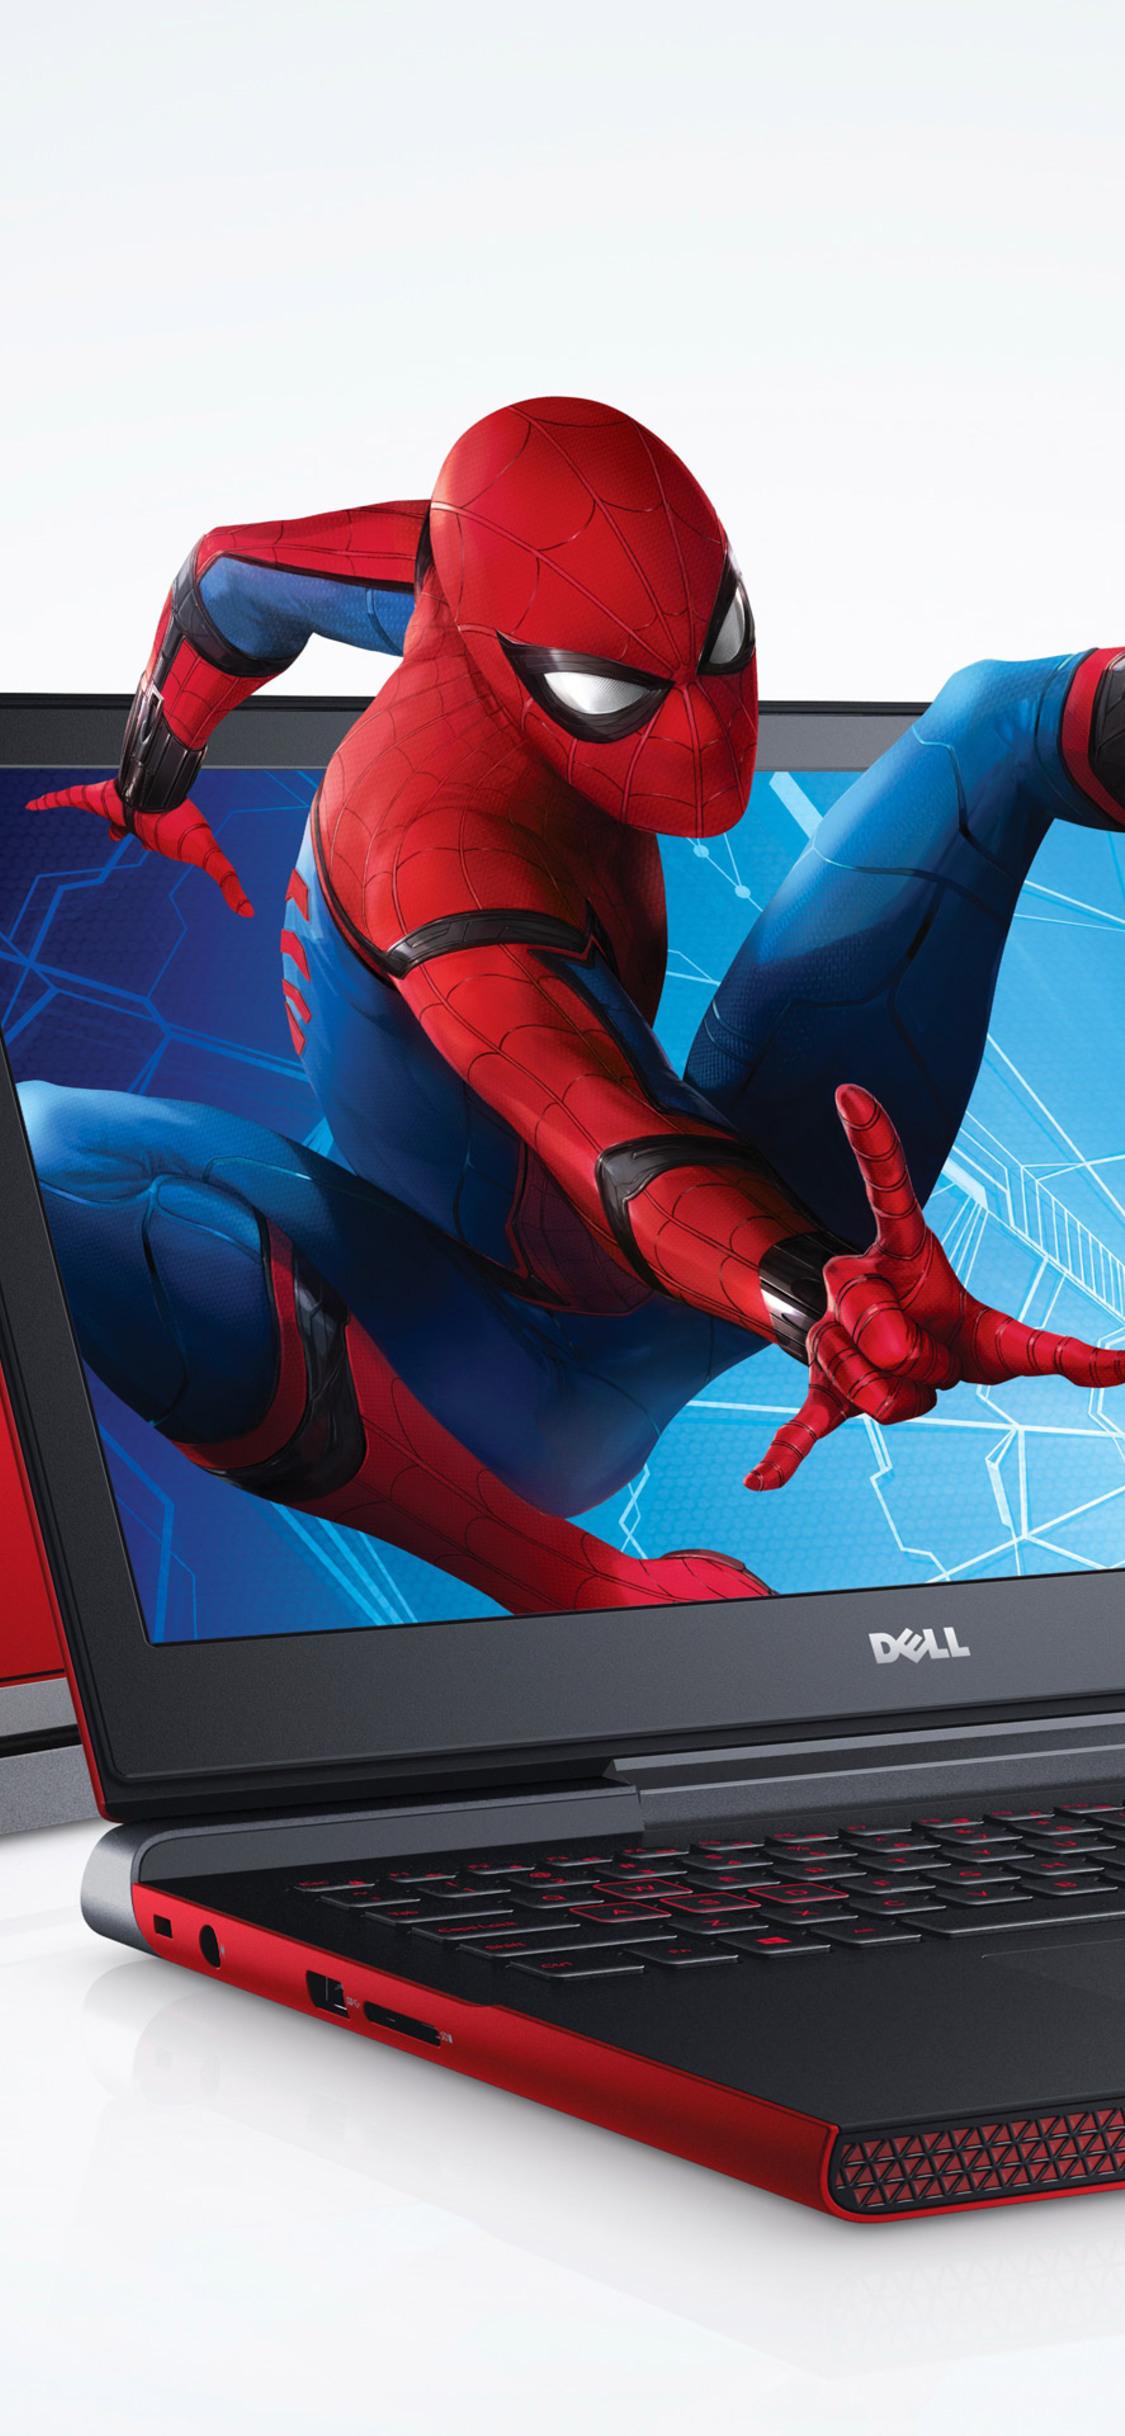 dell-spiderman-edition-inspiron-15-7000-qhd.jpg